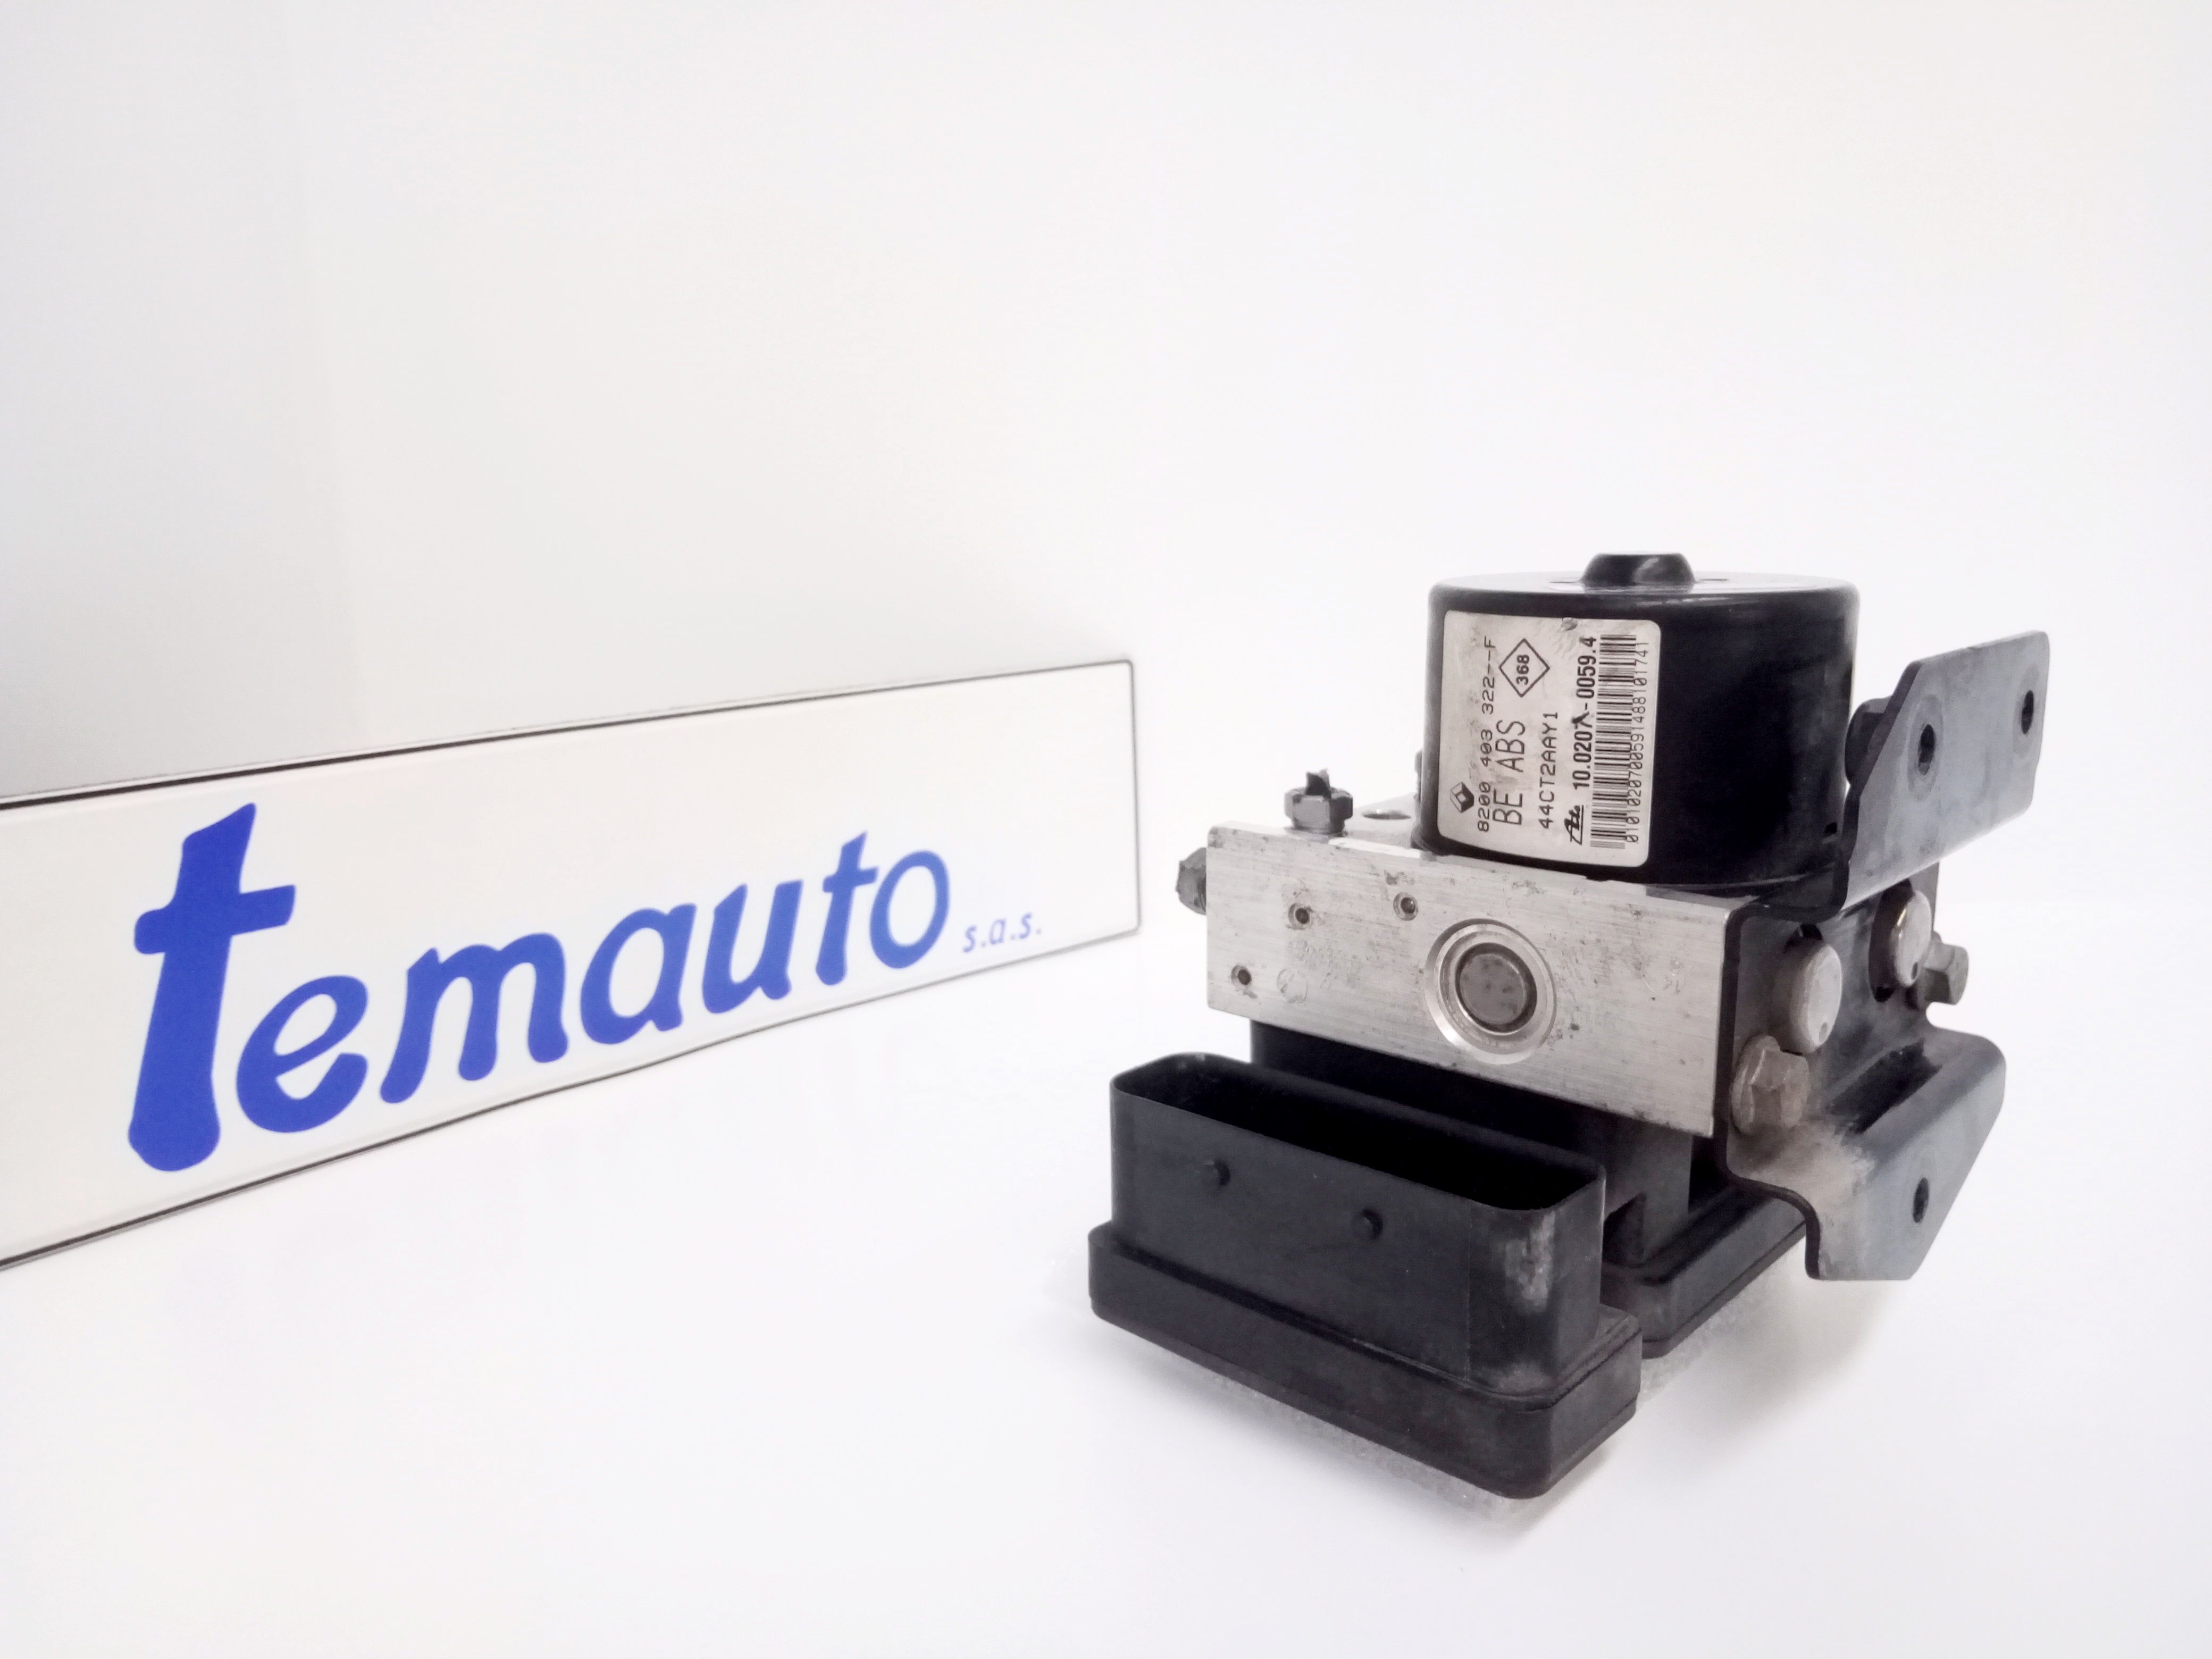 10.0207-0059.4 ABS RENAULT Twingo Serie (07>14) Benzina  (2008) RICAMBI USATI